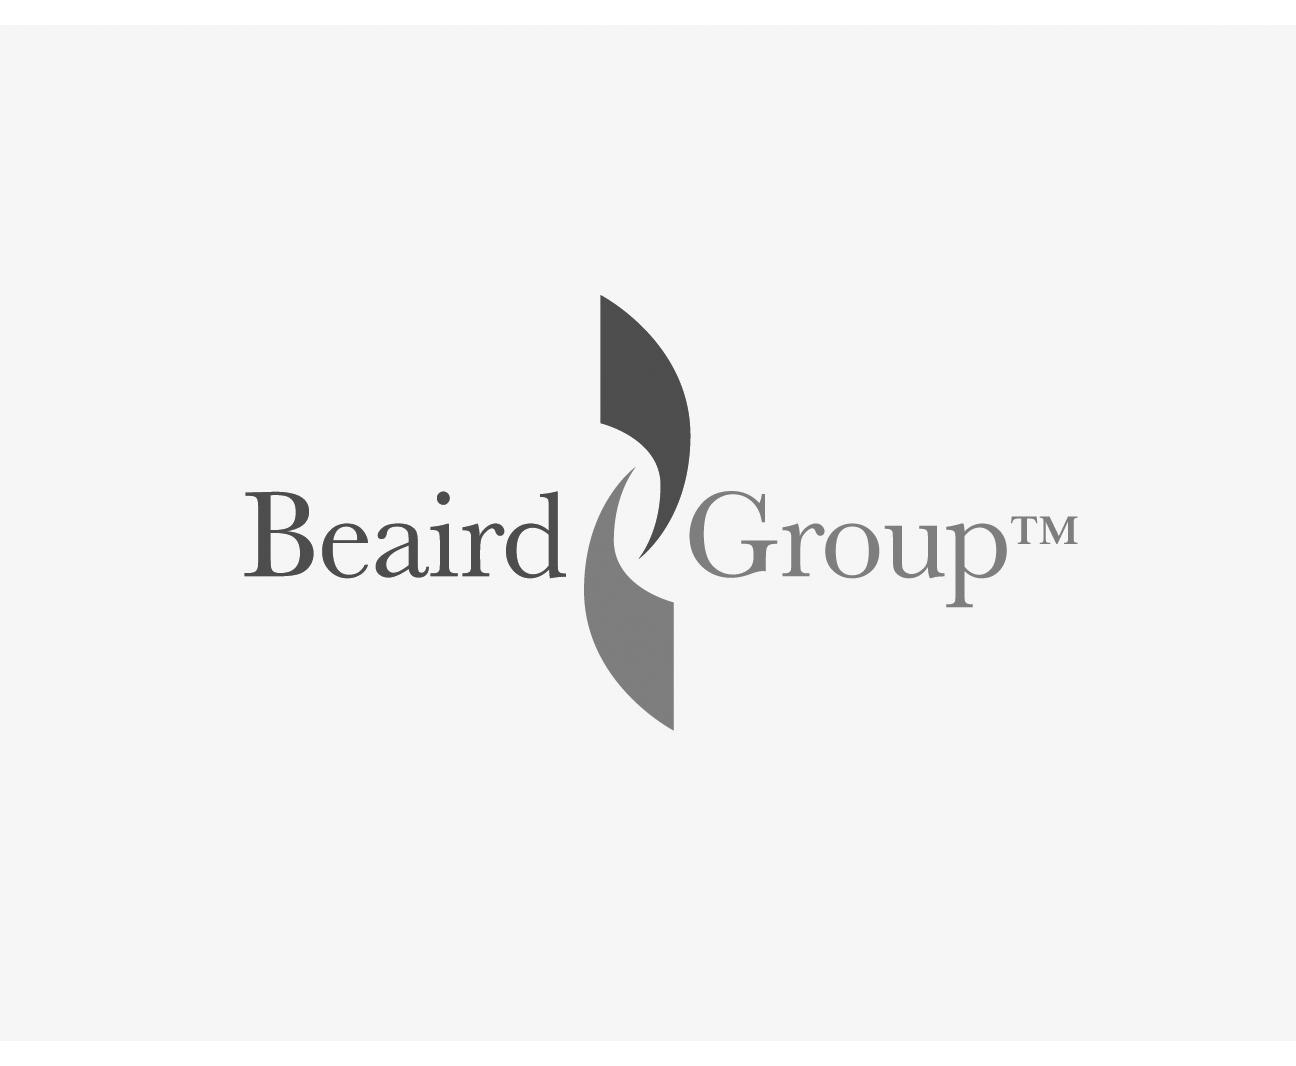 logo_beaird_group_gs.jpg